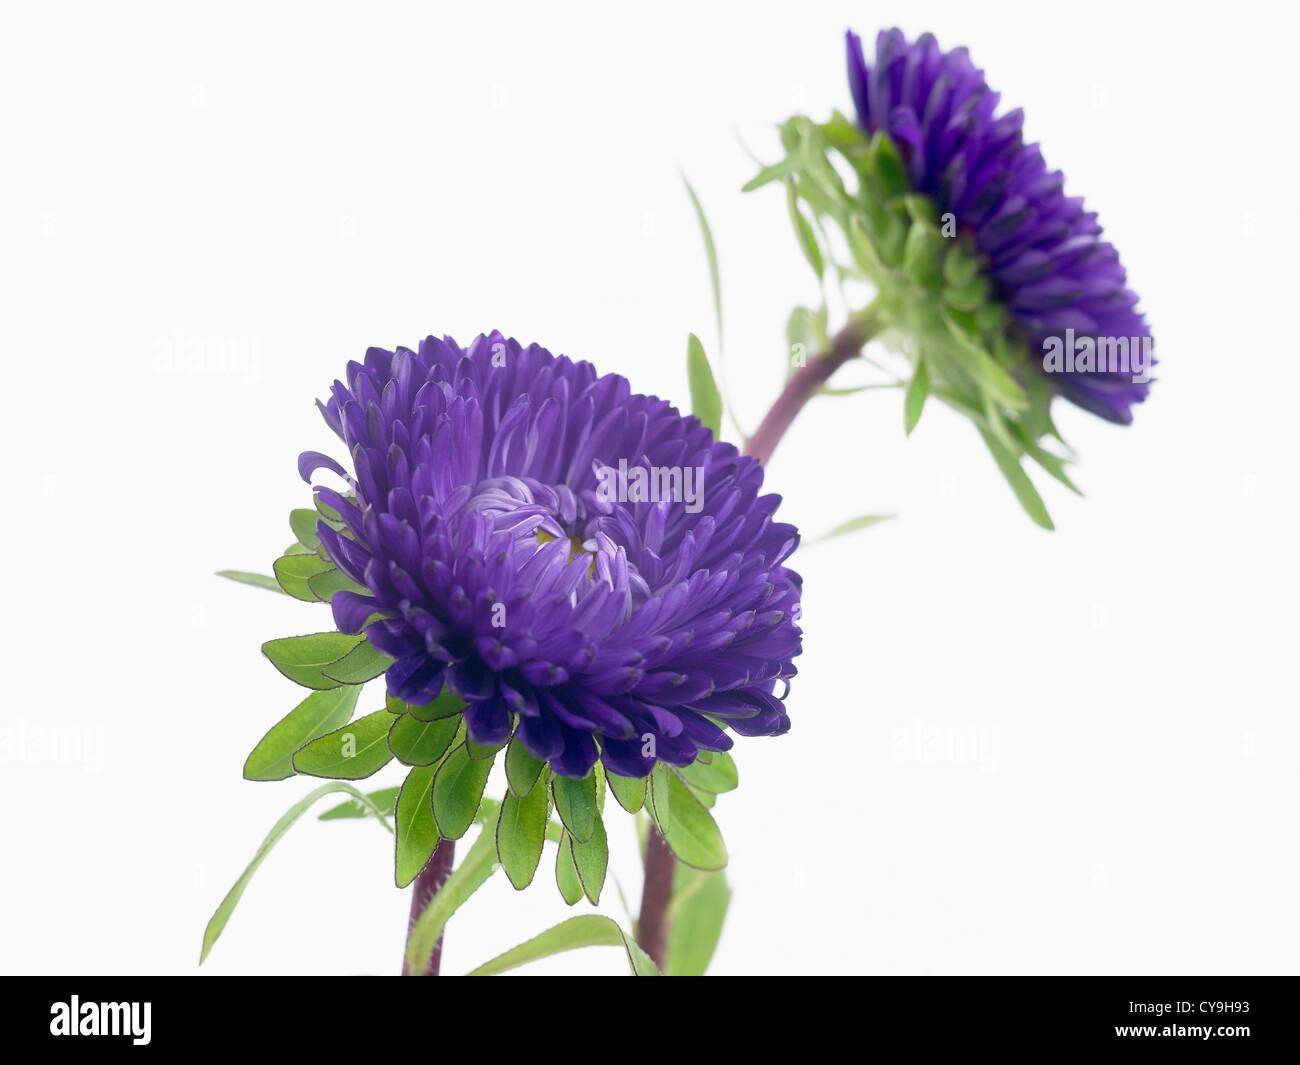 Callistephus chinensis matsumoto china aster purple flowers on callistephus chinensis matsumoto china aster purple flowers on stems against a white background mightylinksfo Choice Image